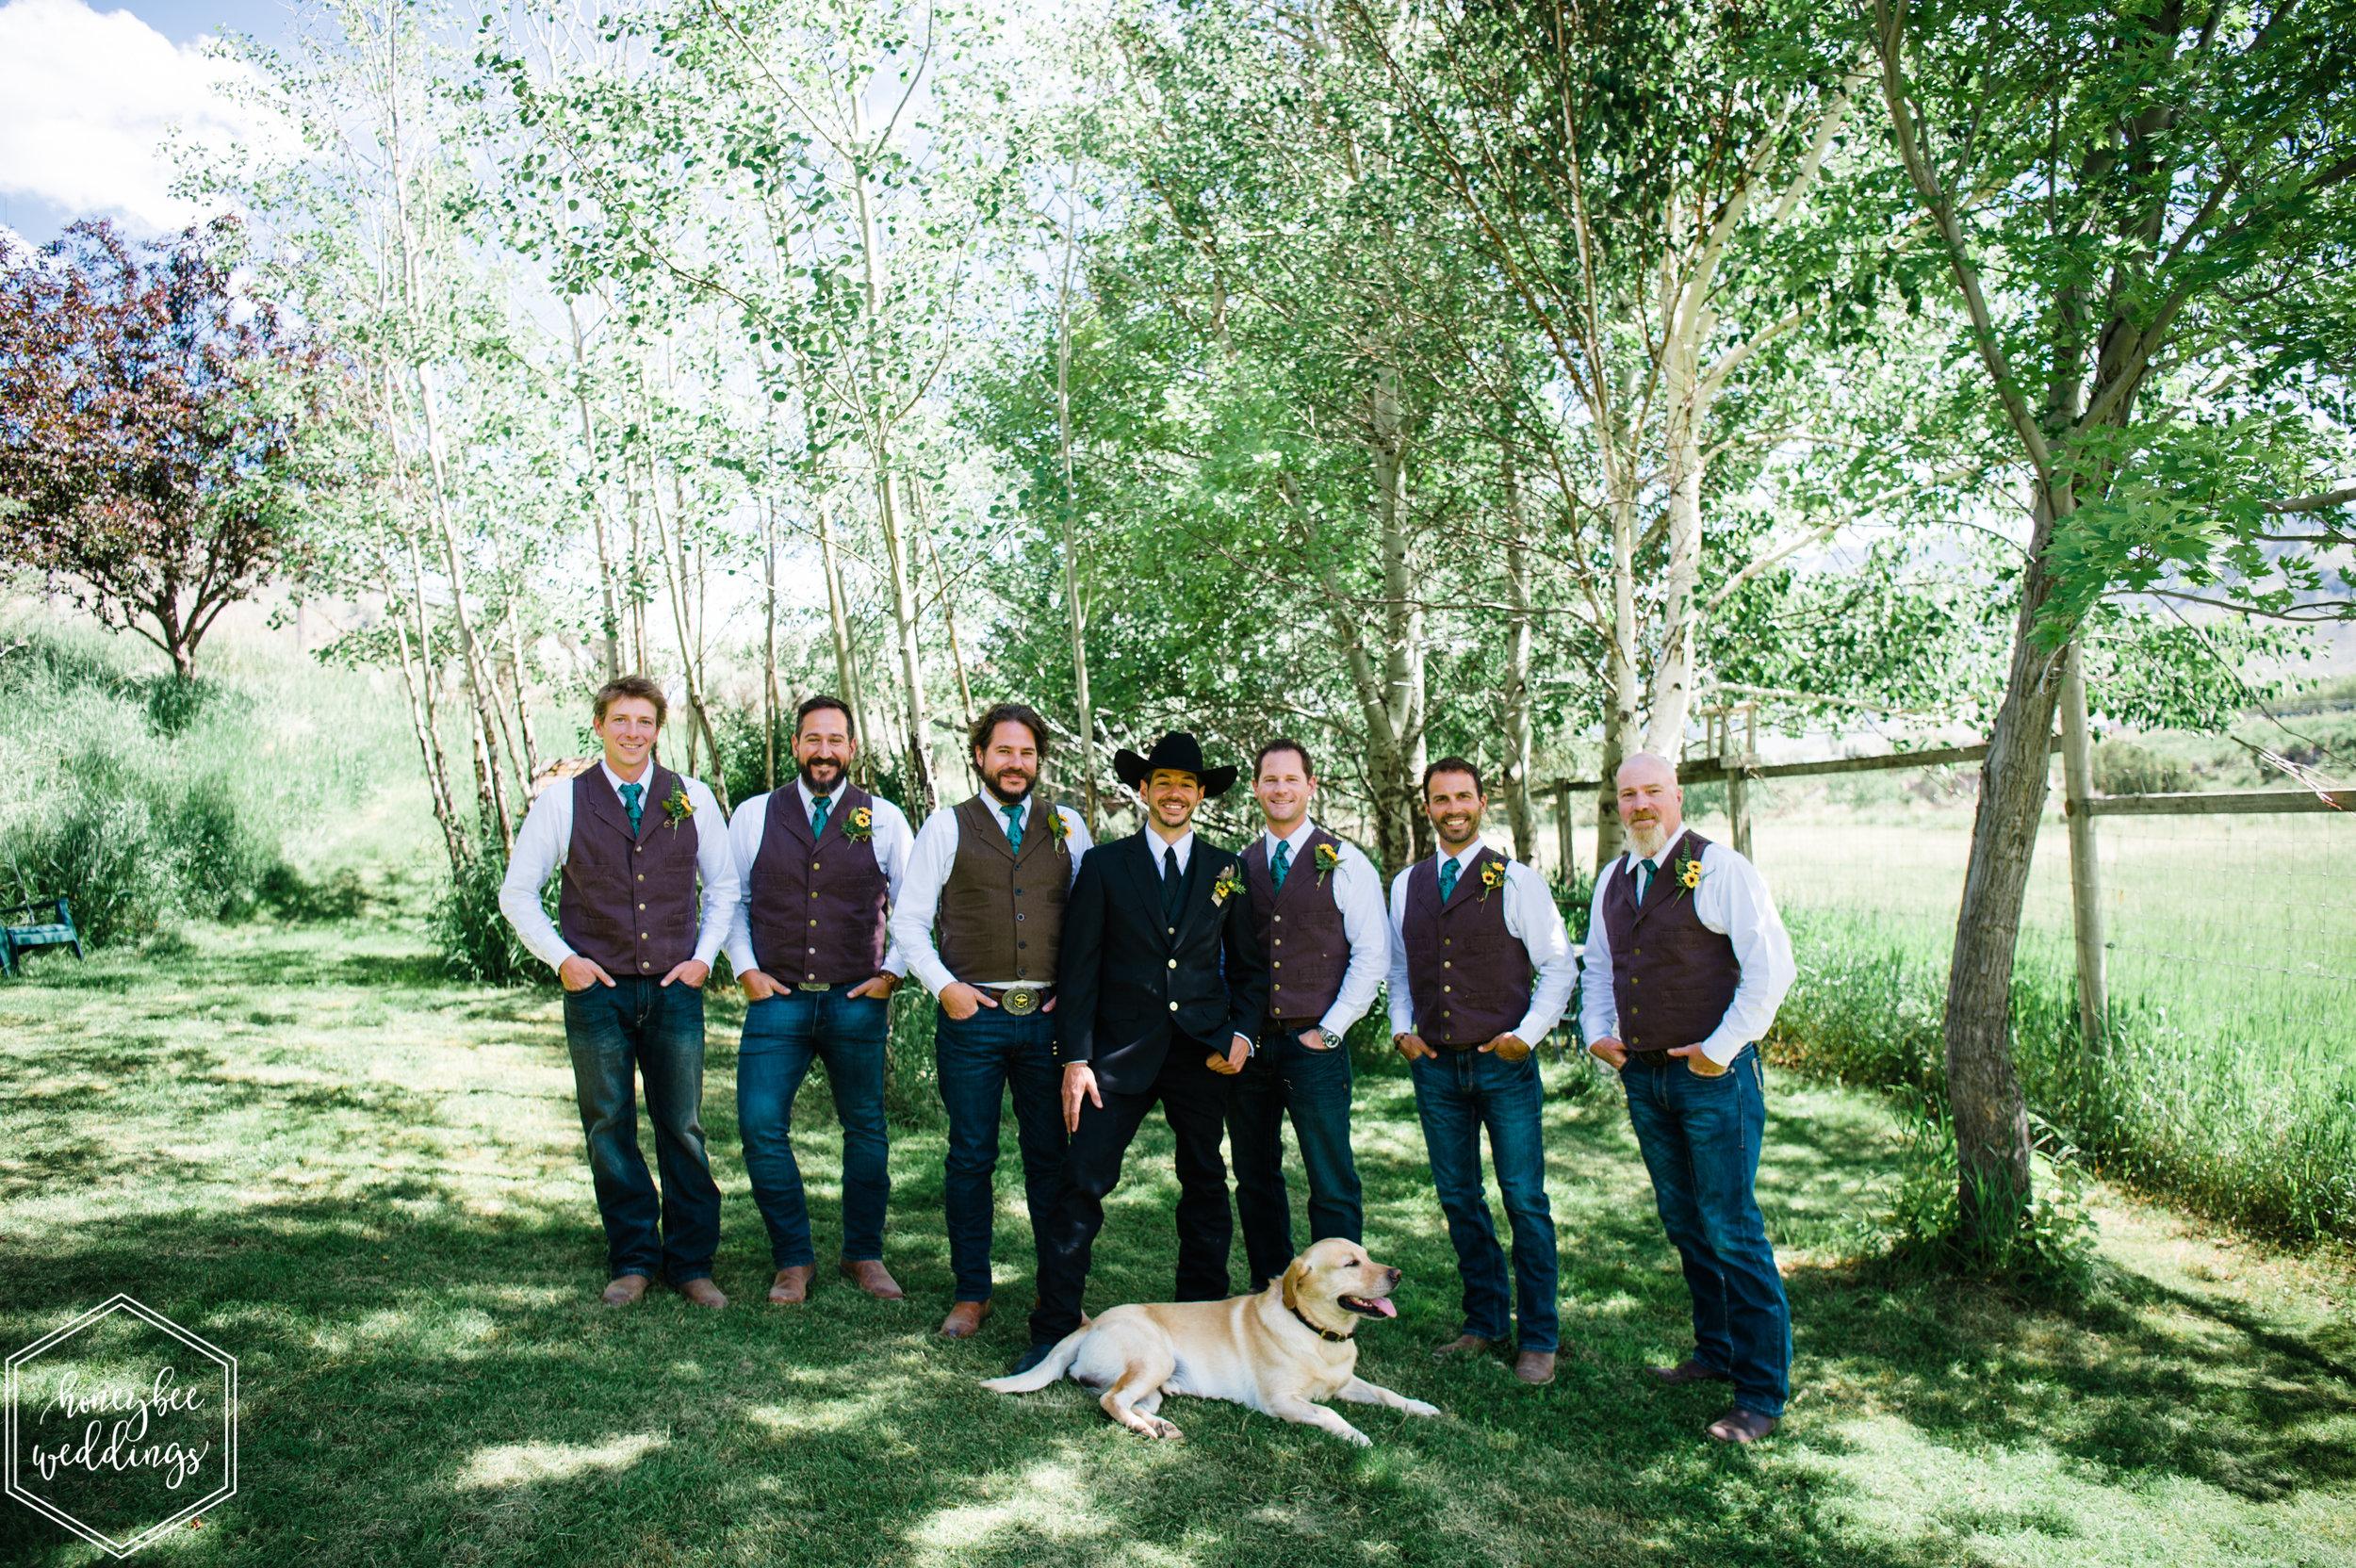 019Yellowstone National Park Wedding_Montana Wedding Photographer_Honeybee Weddings_Shannon & Jonathan_June 29, 2019-222.jpg